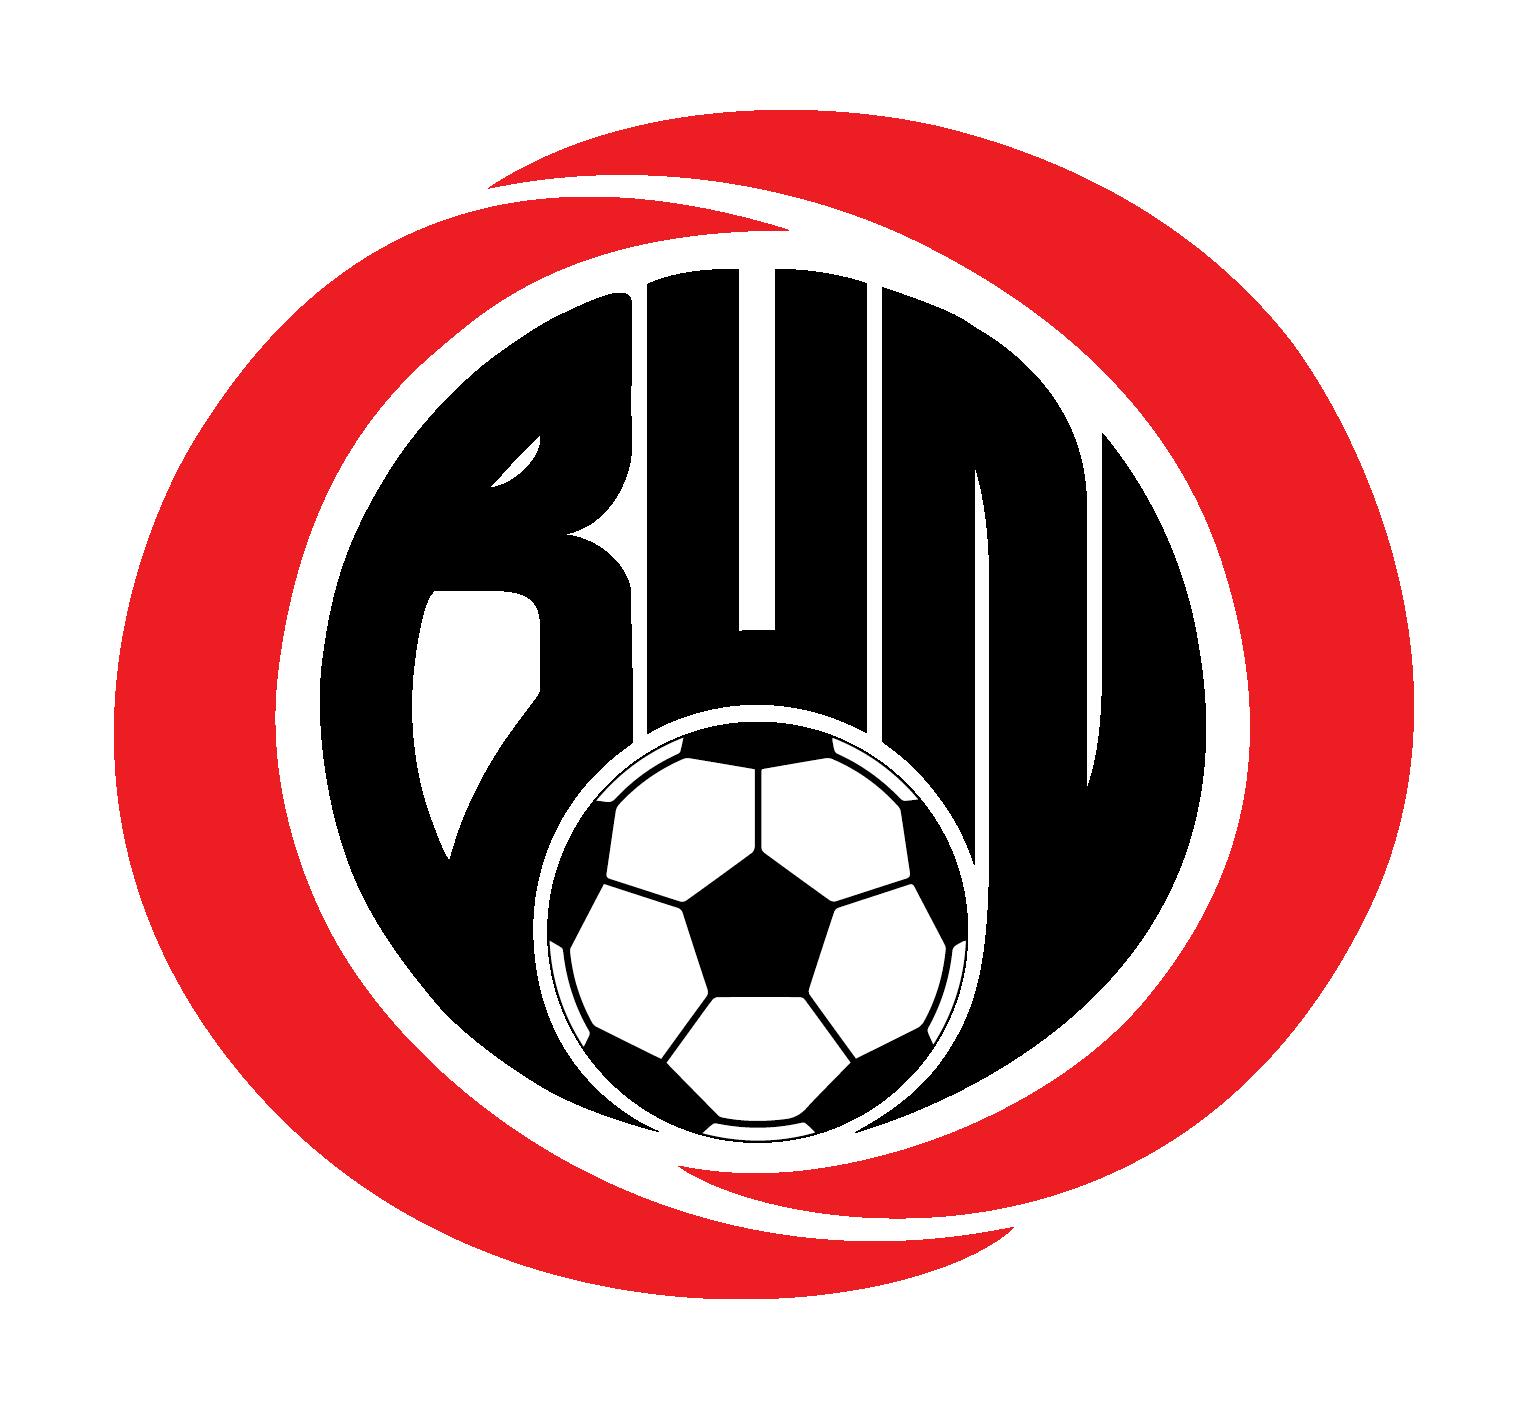 logo Blacks United